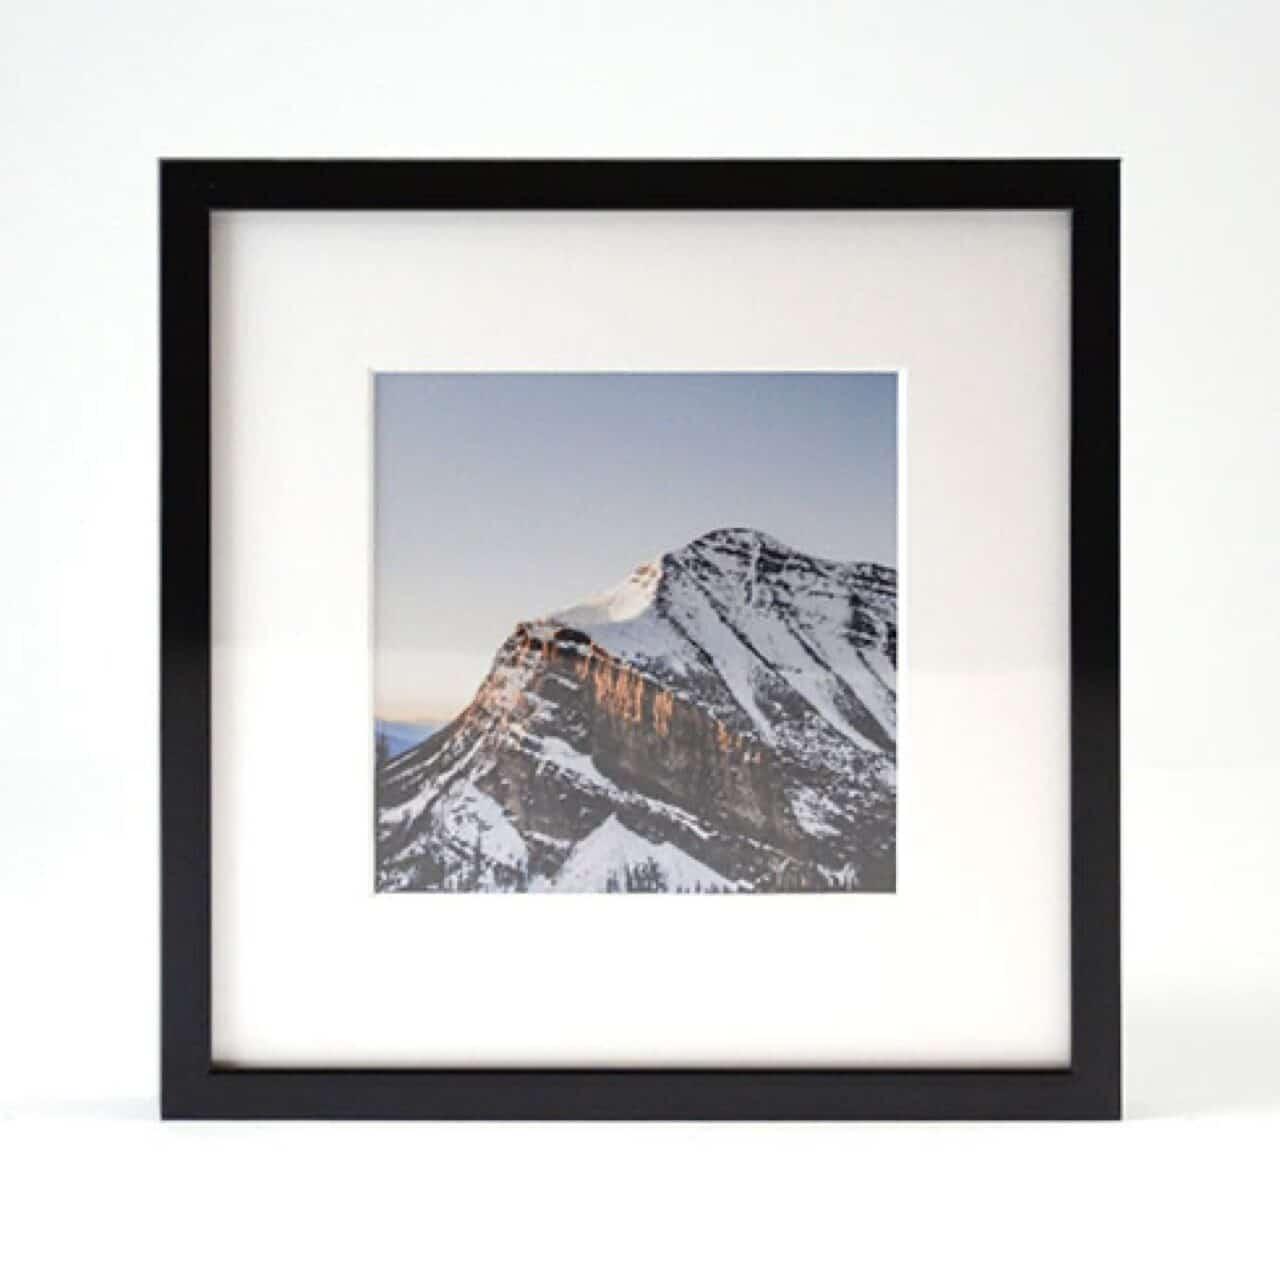 Ashford frame style